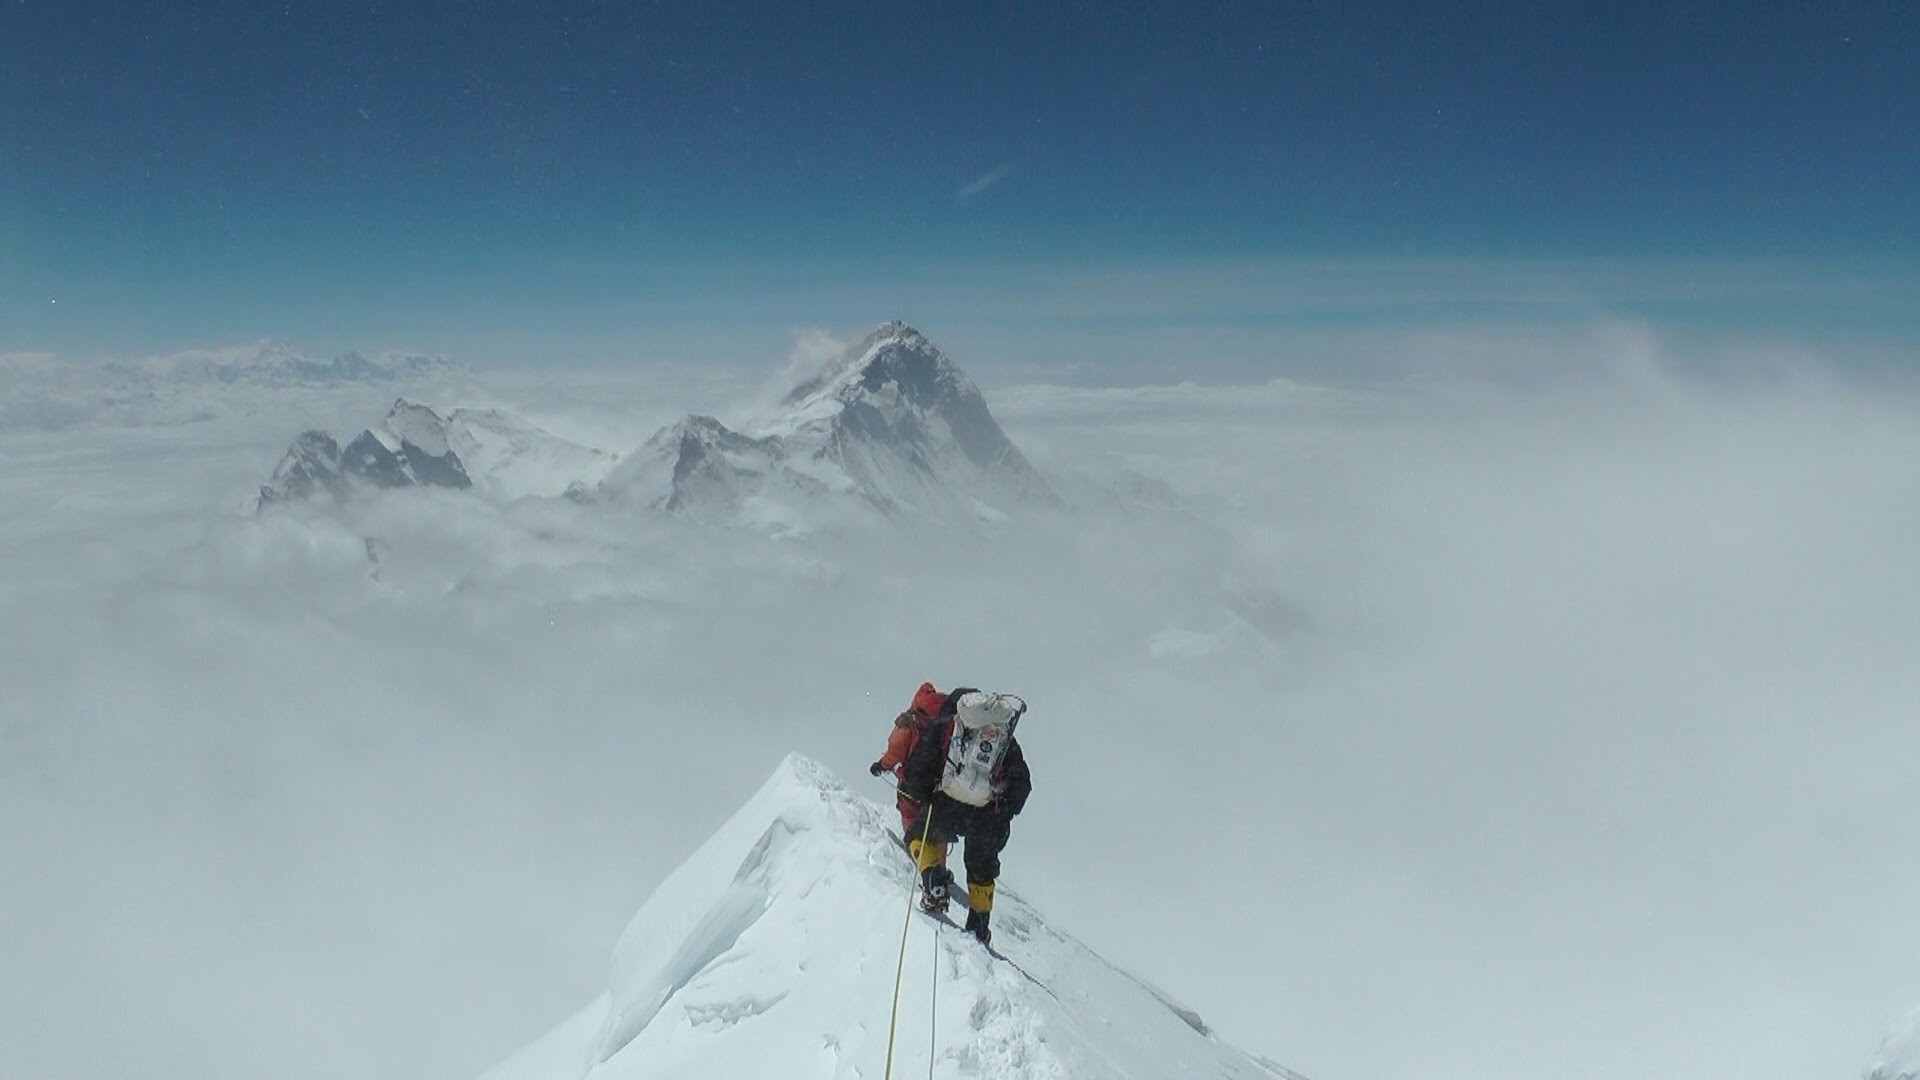 Mount Everest Wallpaper Wallpapertag